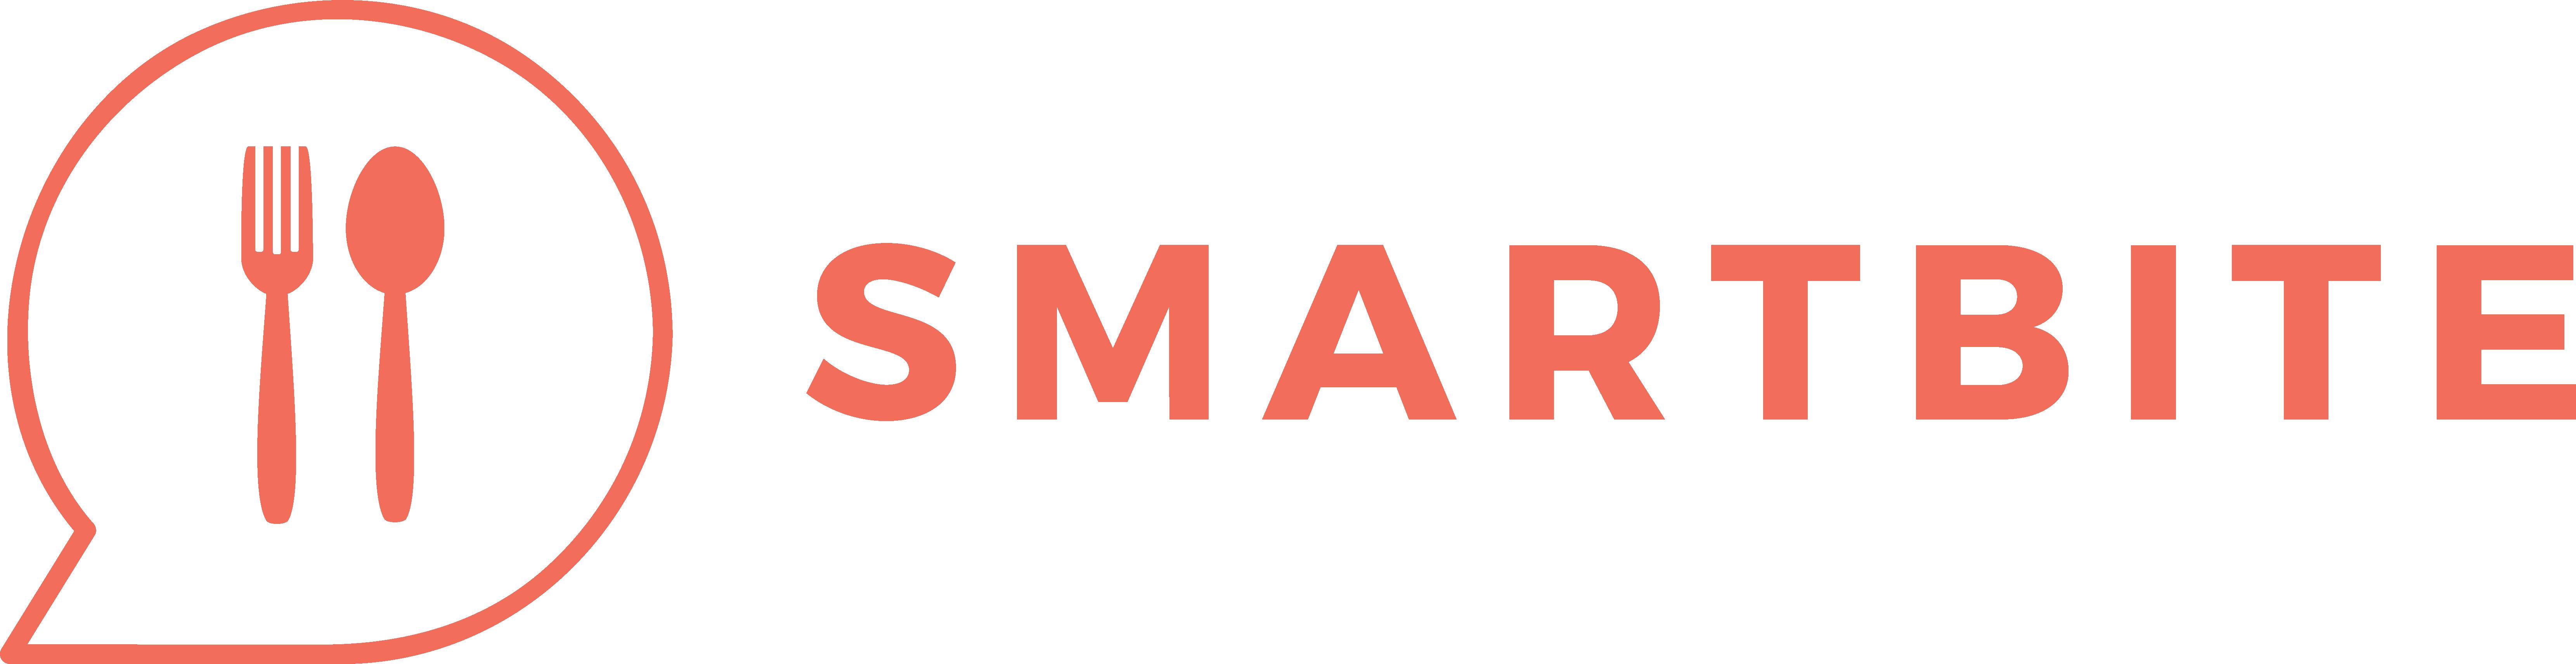 smartbite_logo-3